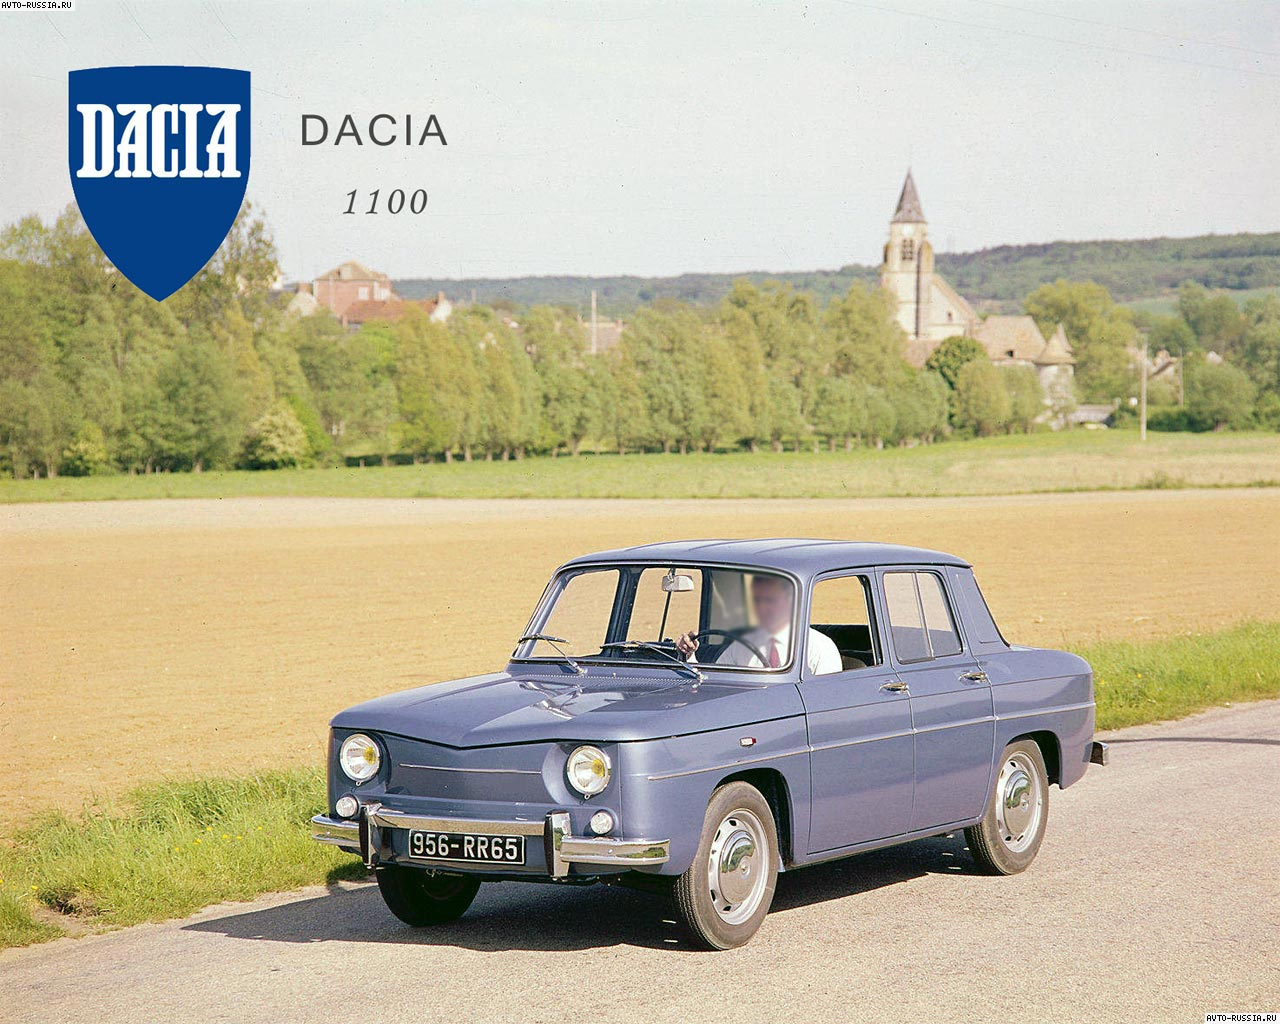 Dacia 1100 1971avto-russia ru dacia_1100_1280x1024